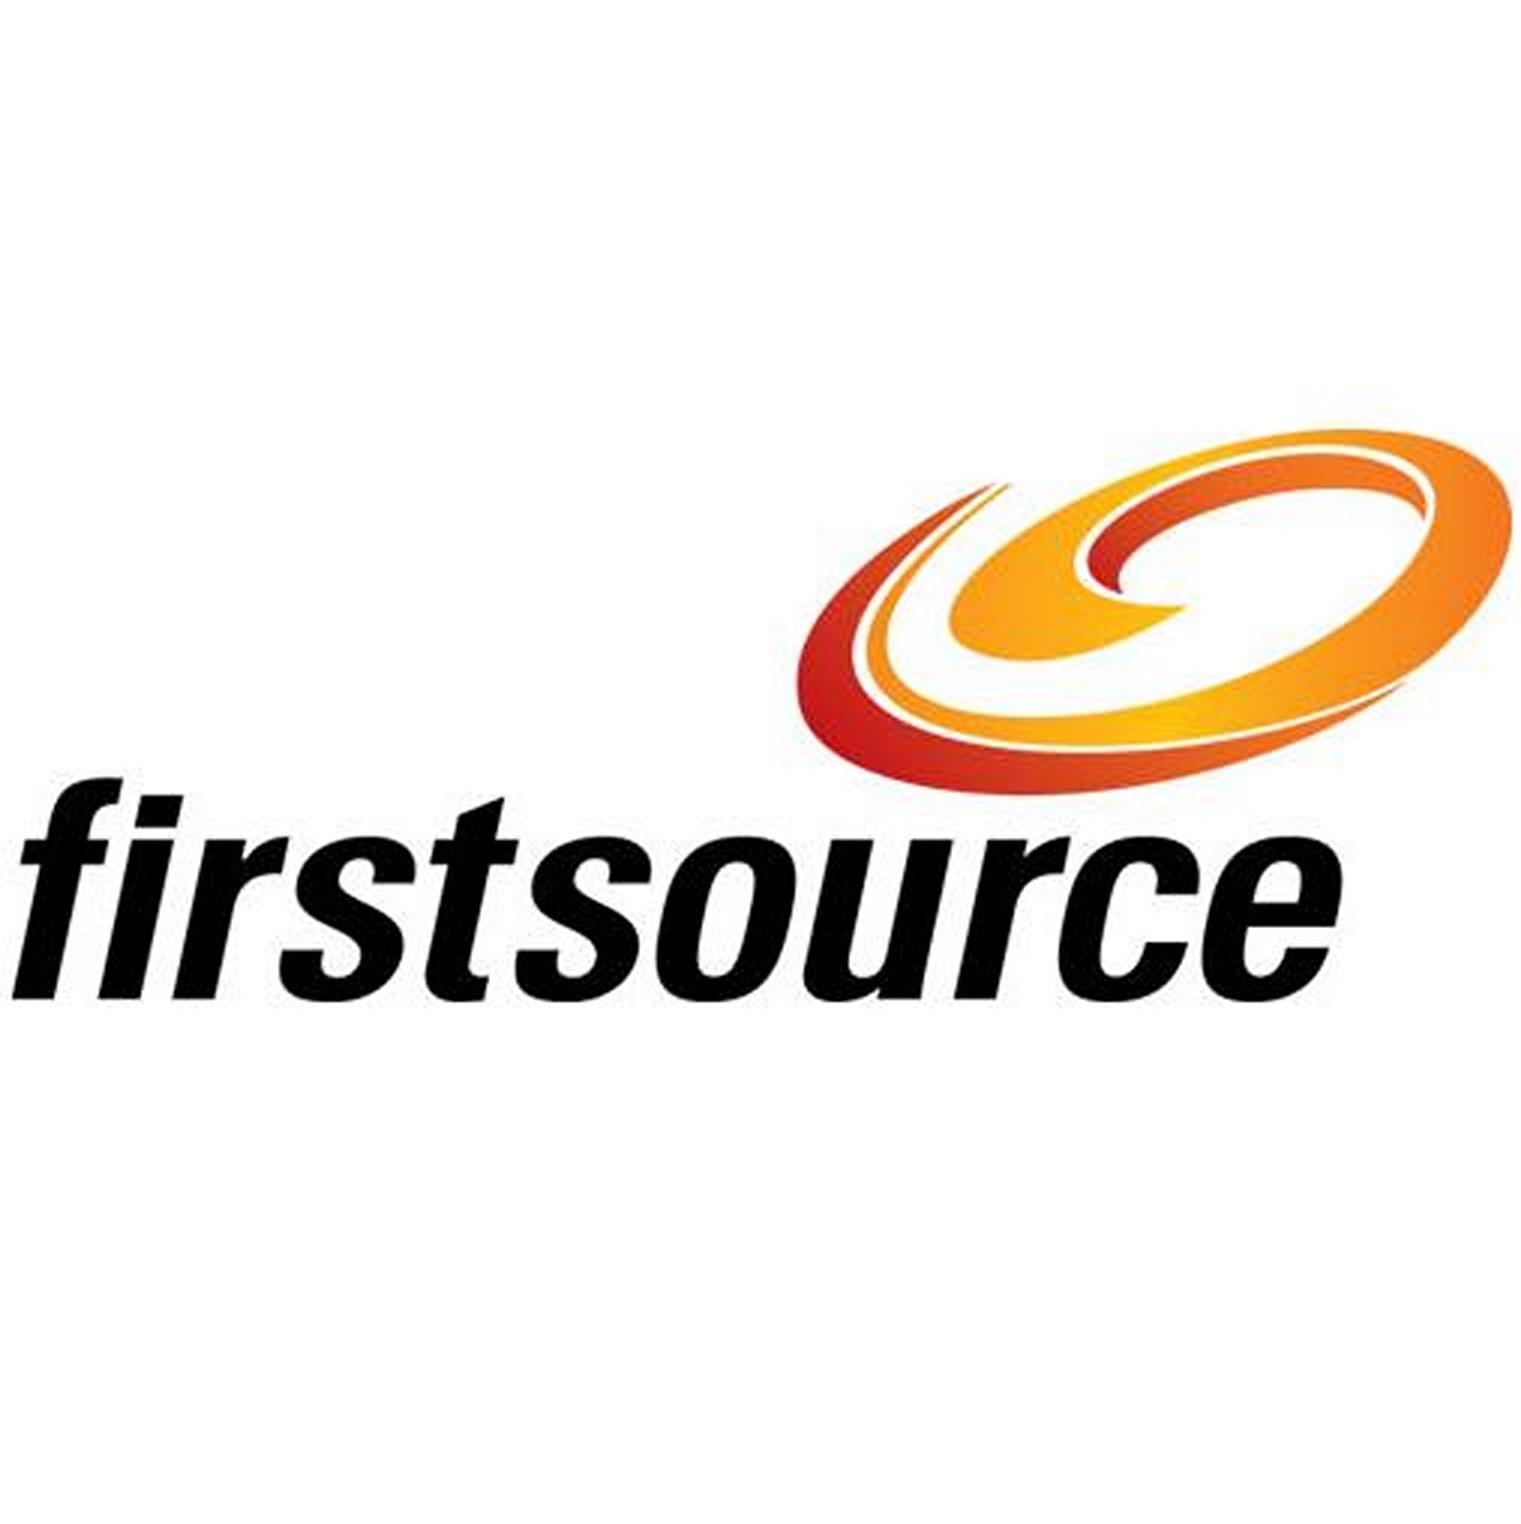 Firstsource Freshers Walkin Recruitment